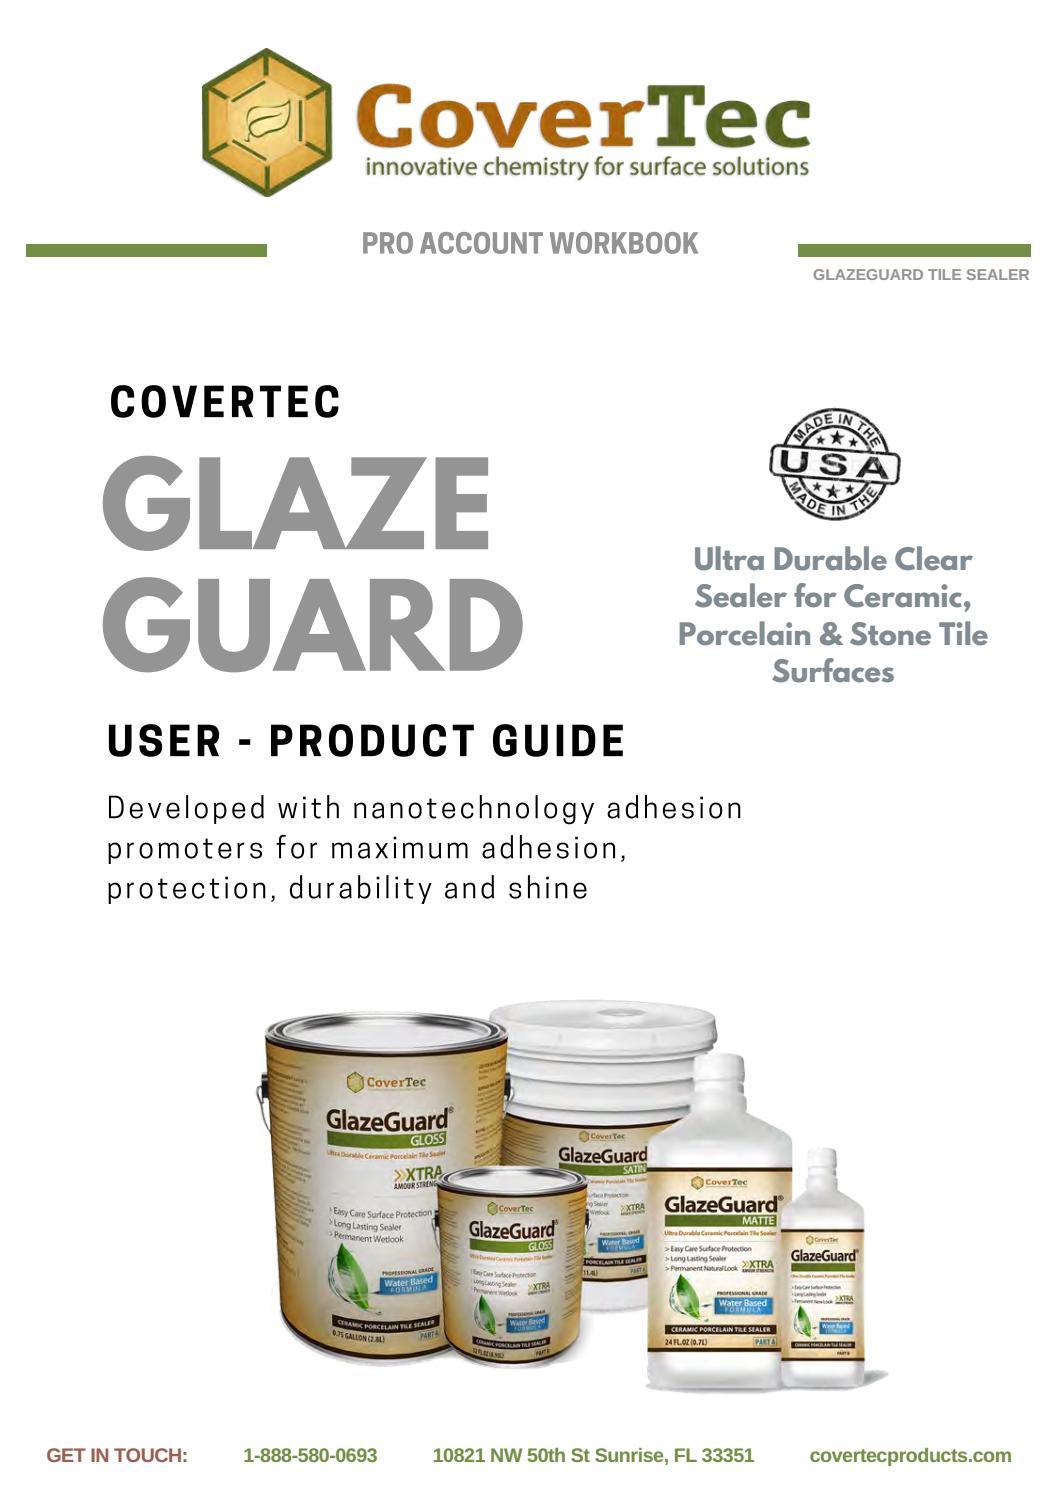 glazeguard pro account guide march 2018